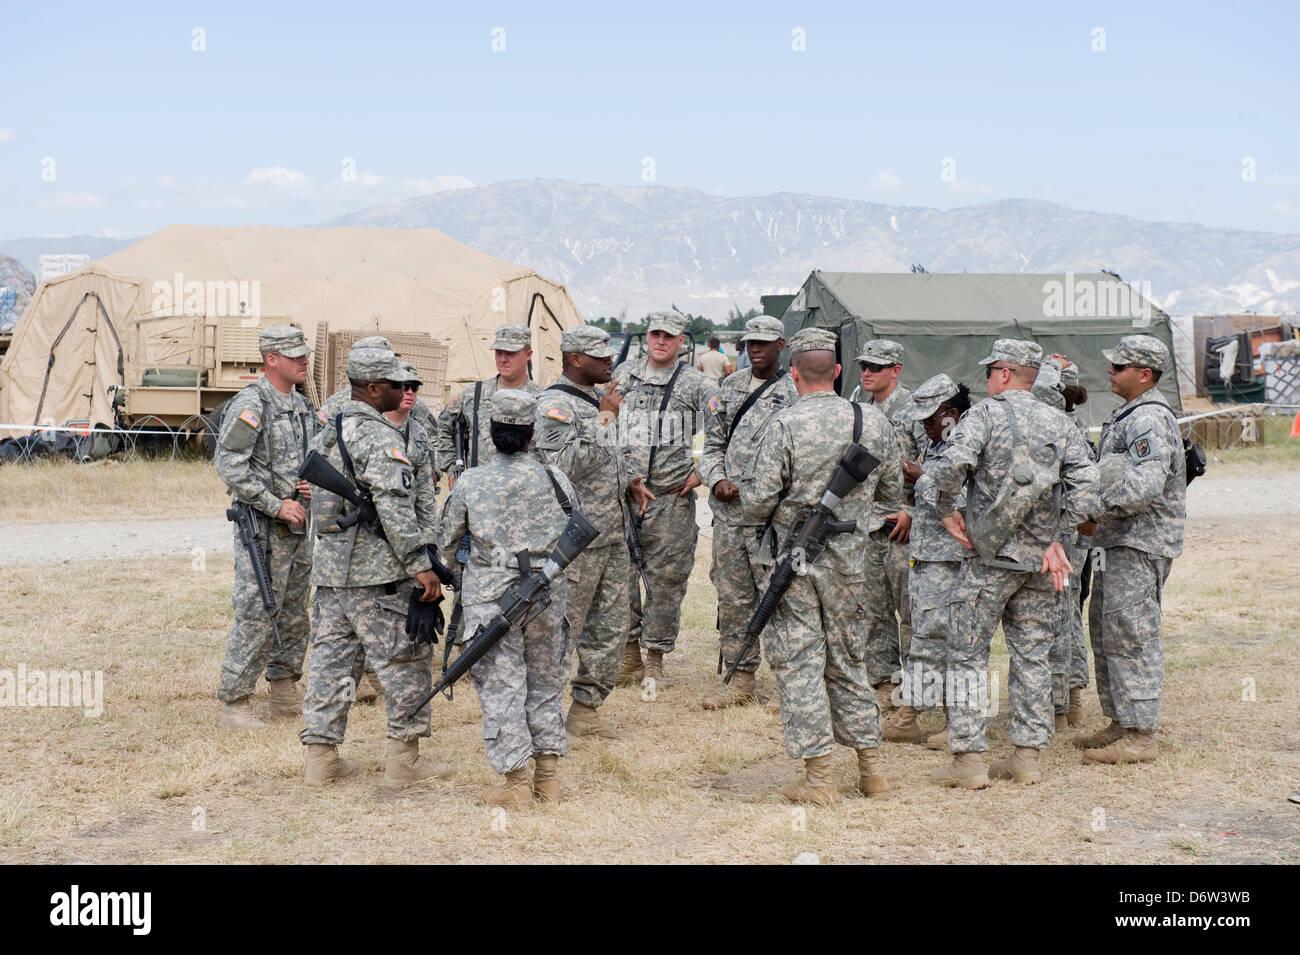 US Army at Port au Prince airport after the 2010 earthquake, Port au Prince, Haiti, Caribbean - Stock Image